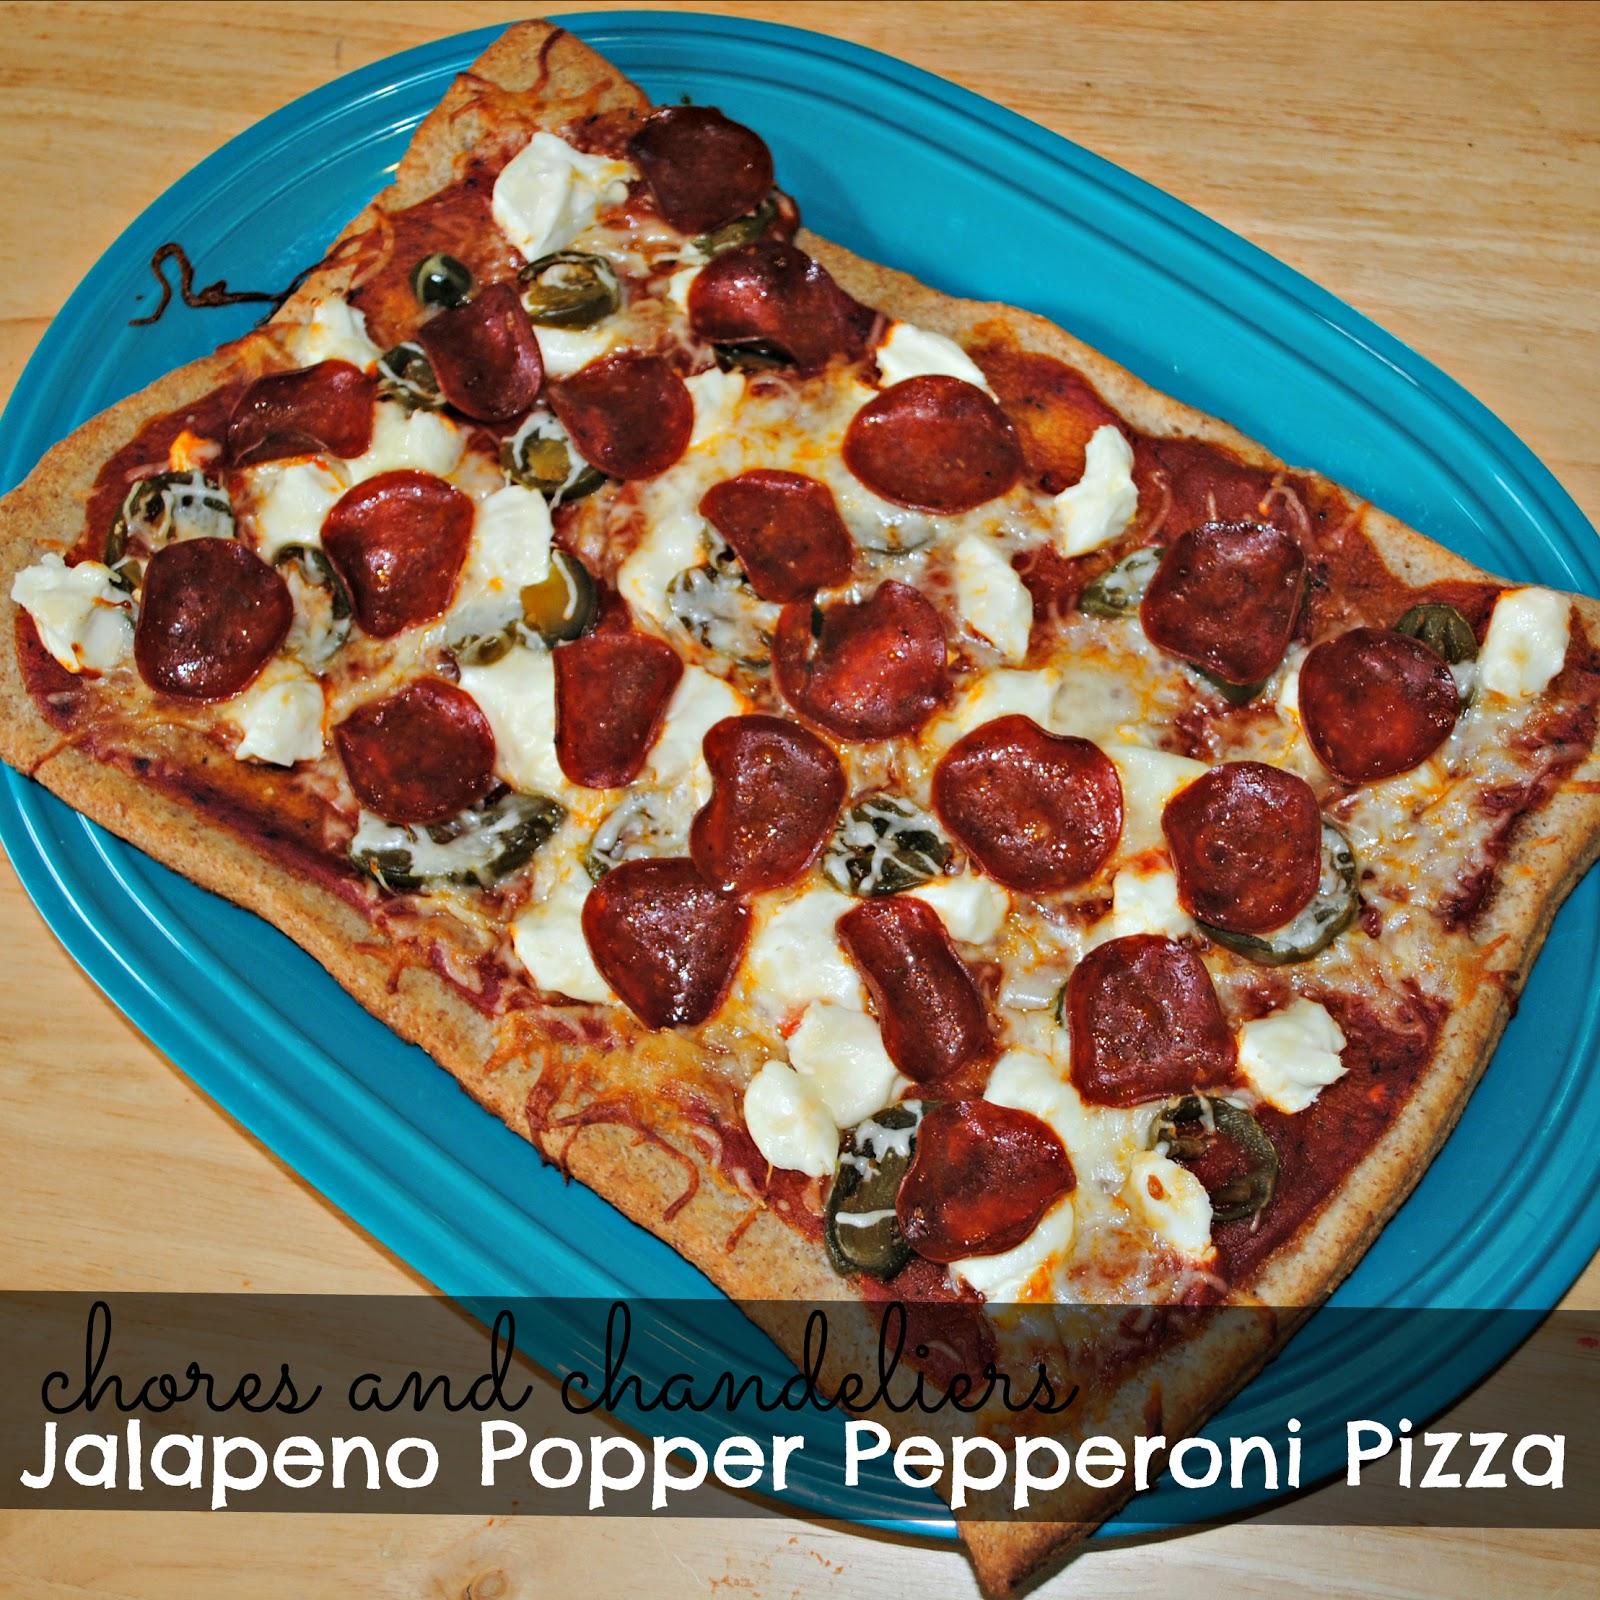 ... chandeliers: Jalapeno Popper Pepperoni Pizza {Suzi Homefaker Style